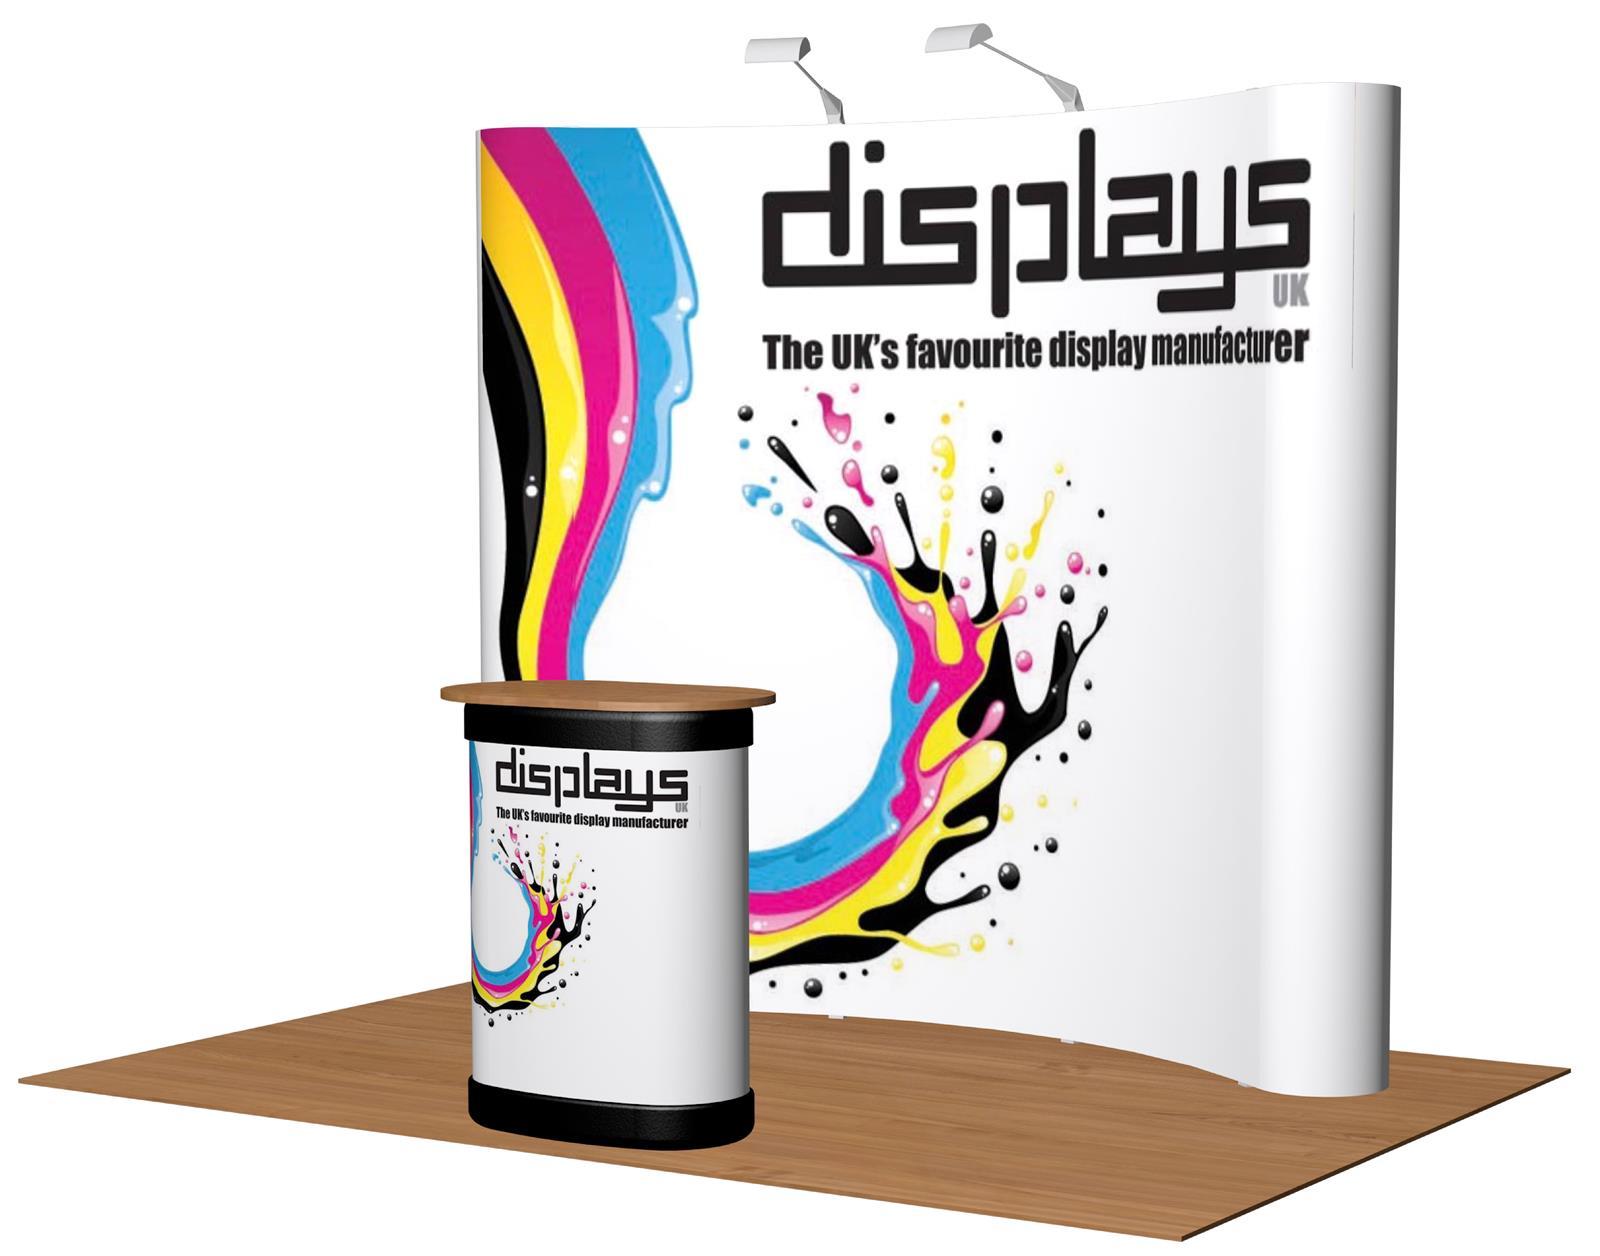 3x3 Visage Premium Pop Up Exhibition Stand Display